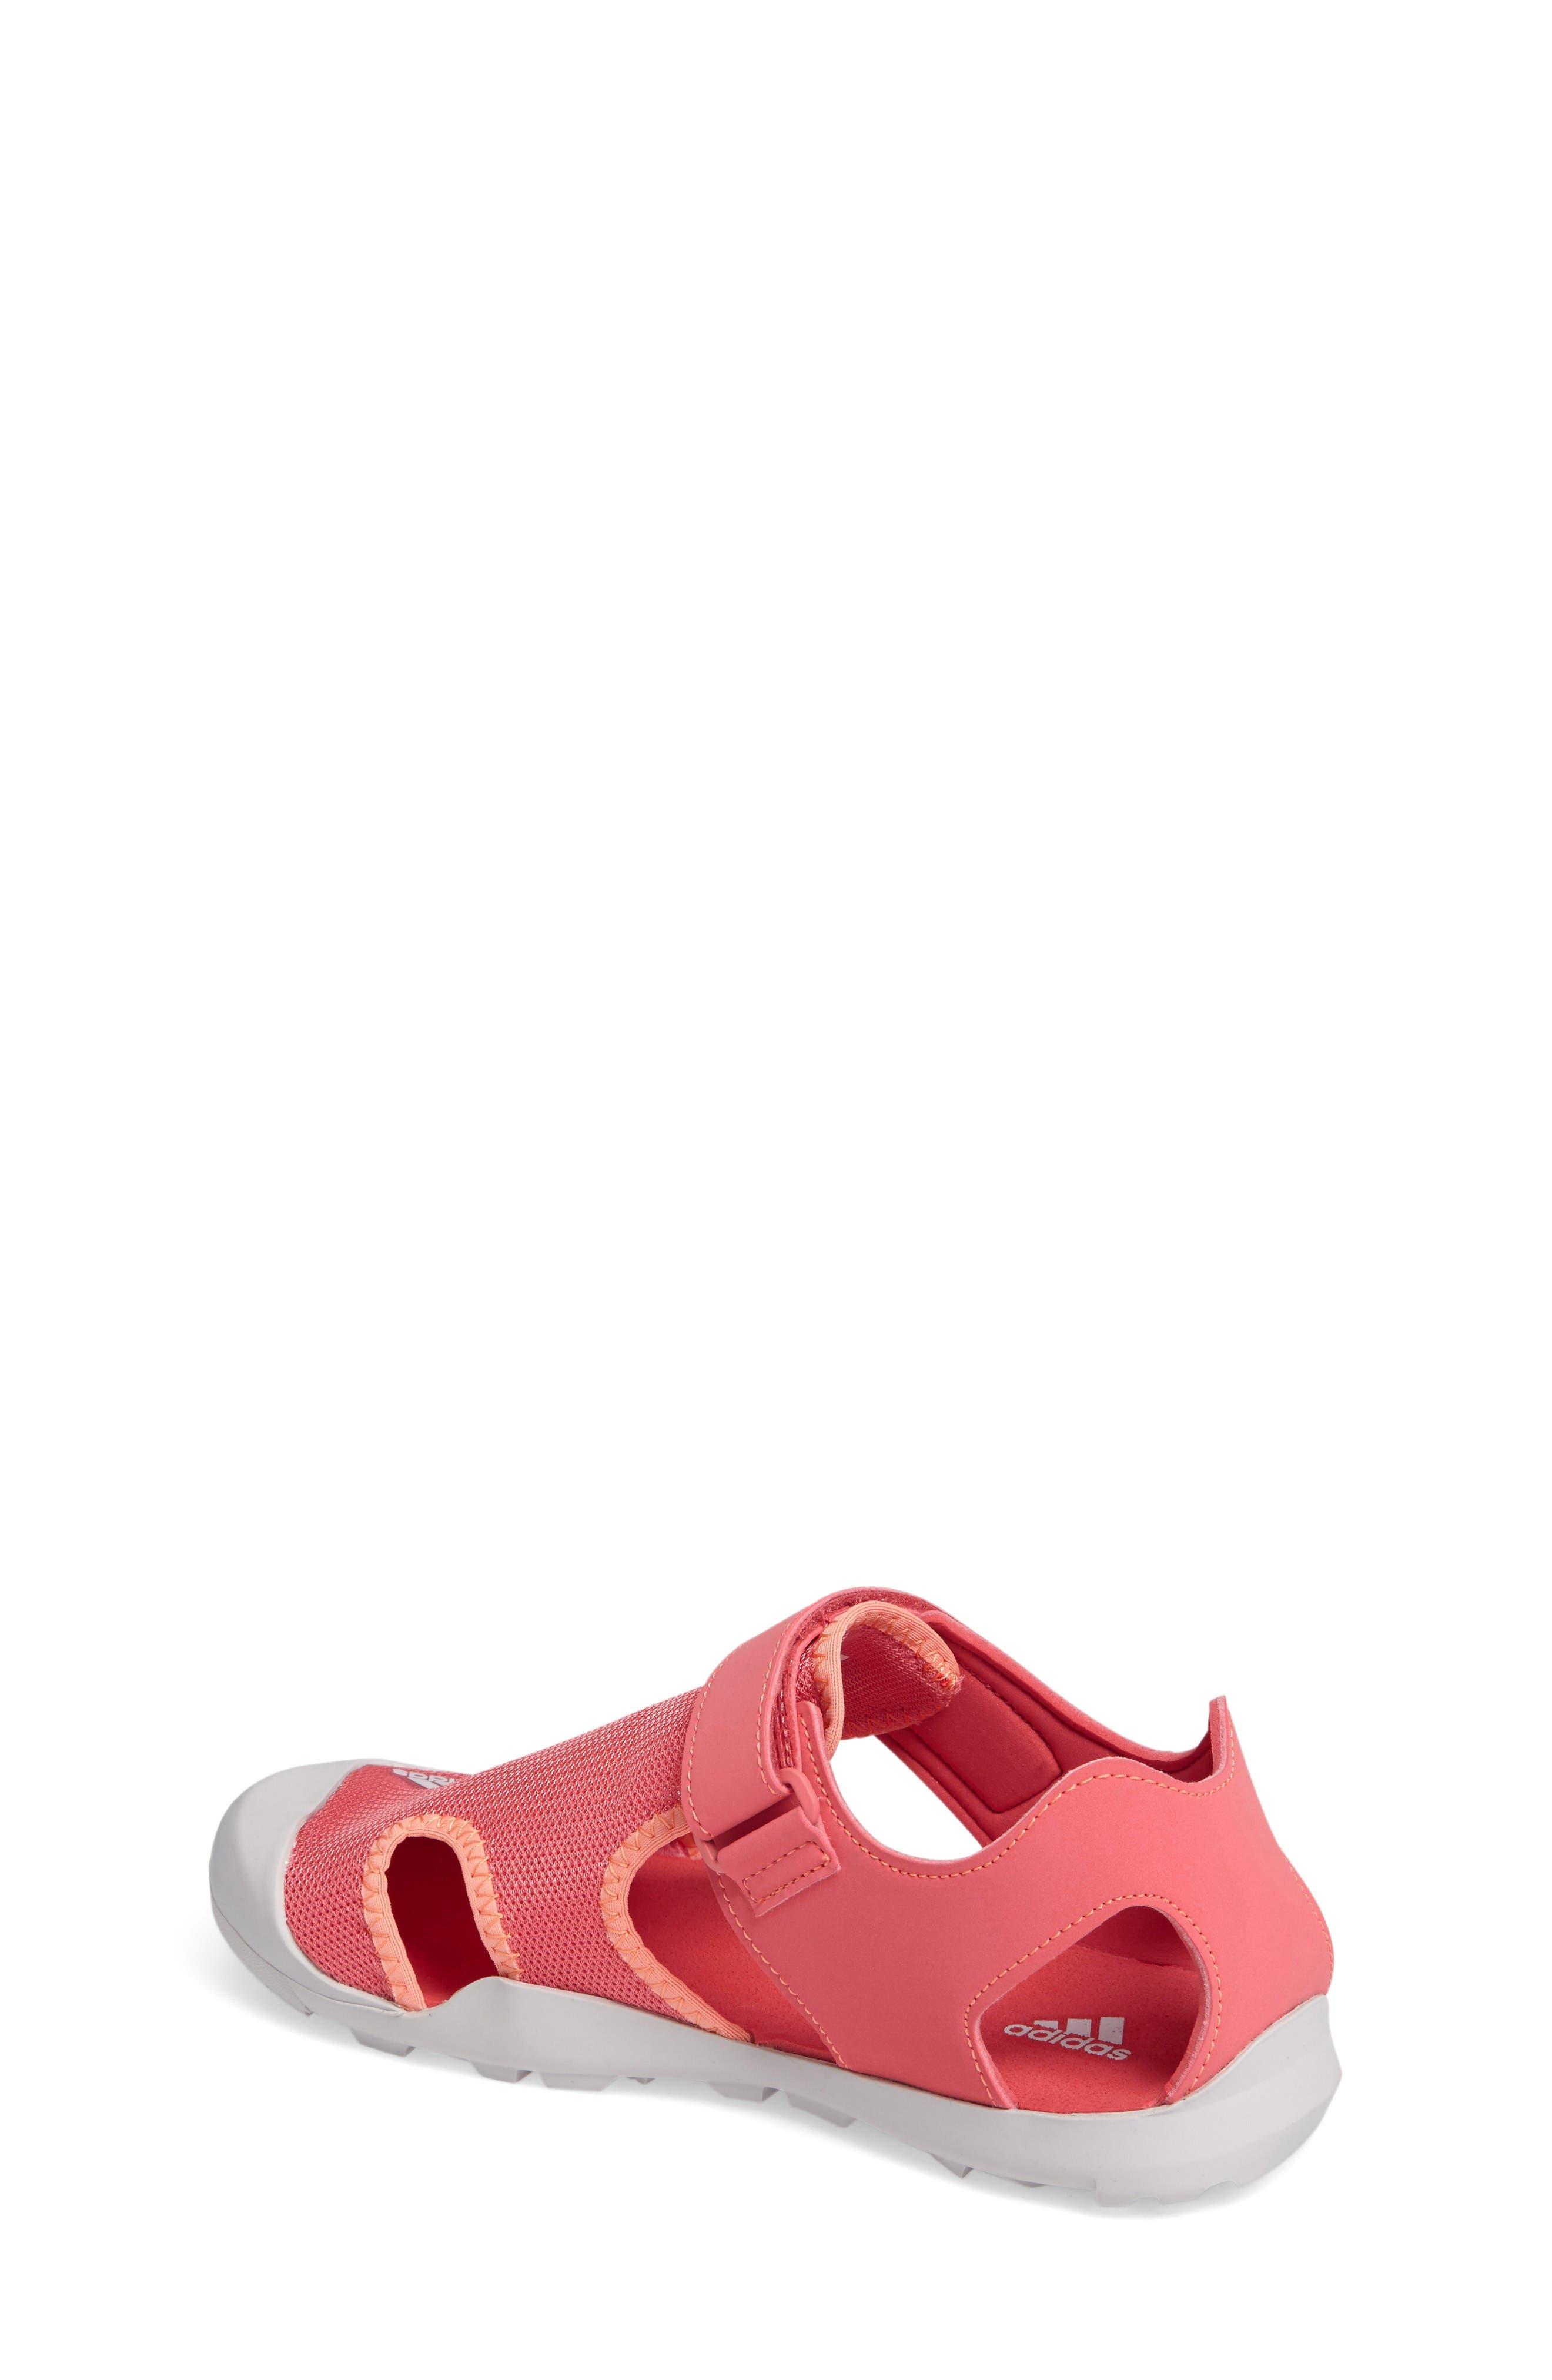 Captain Toey Sandal,                             Alternate thumbnail 2, color,                             Tactile Pink/ Purple/ Orange